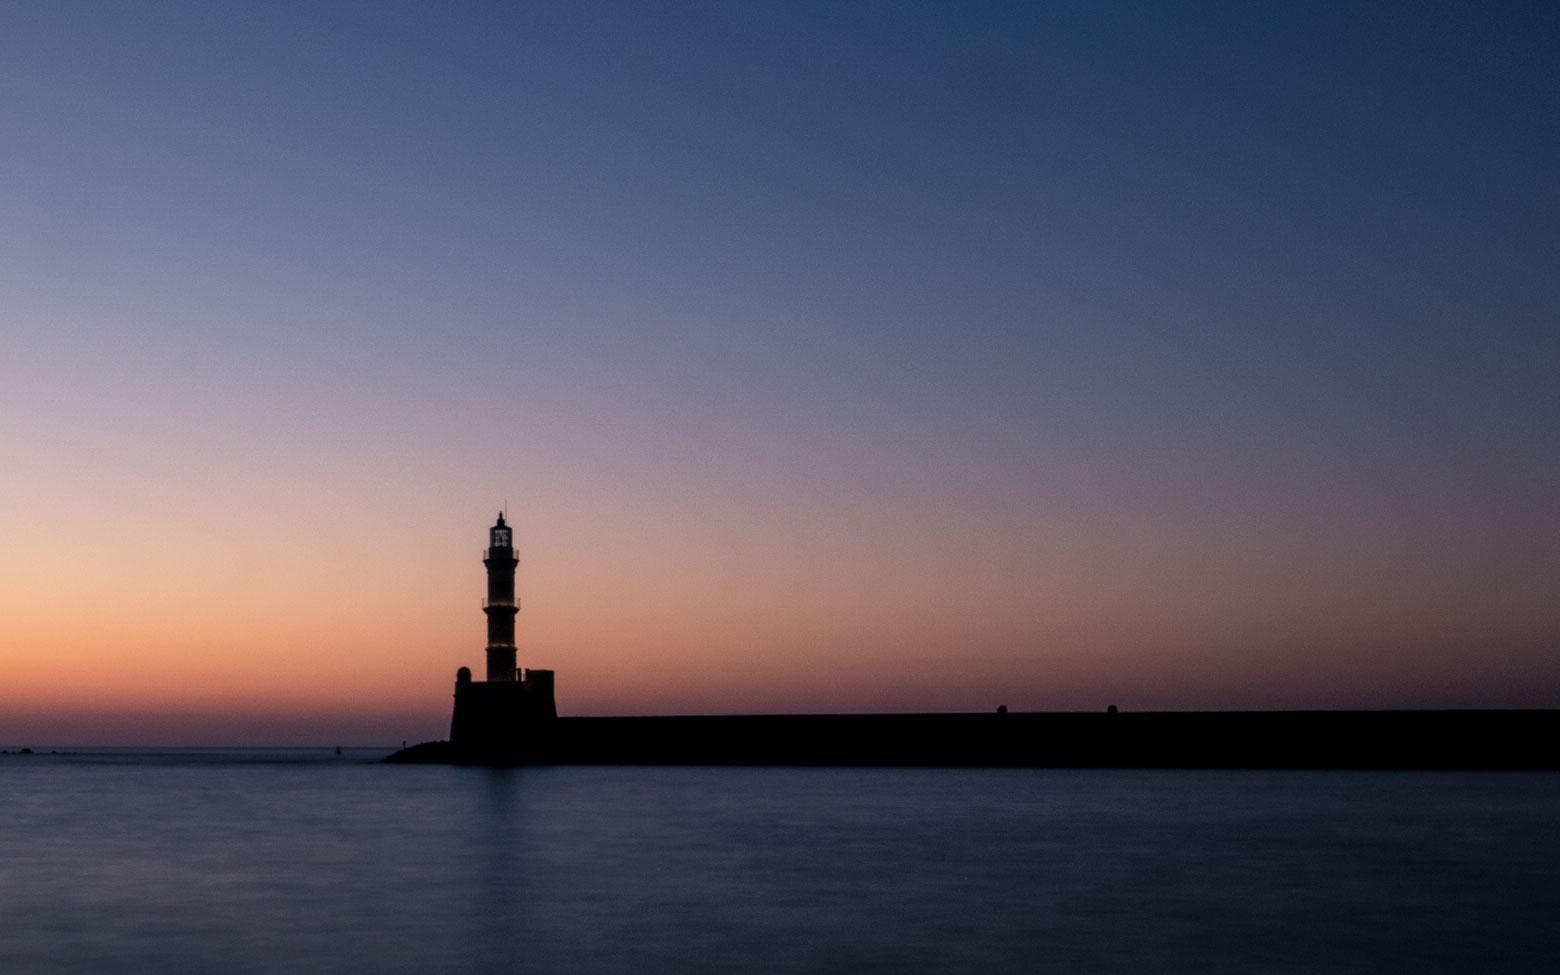 Crete Photo - Lighthouse of Chania